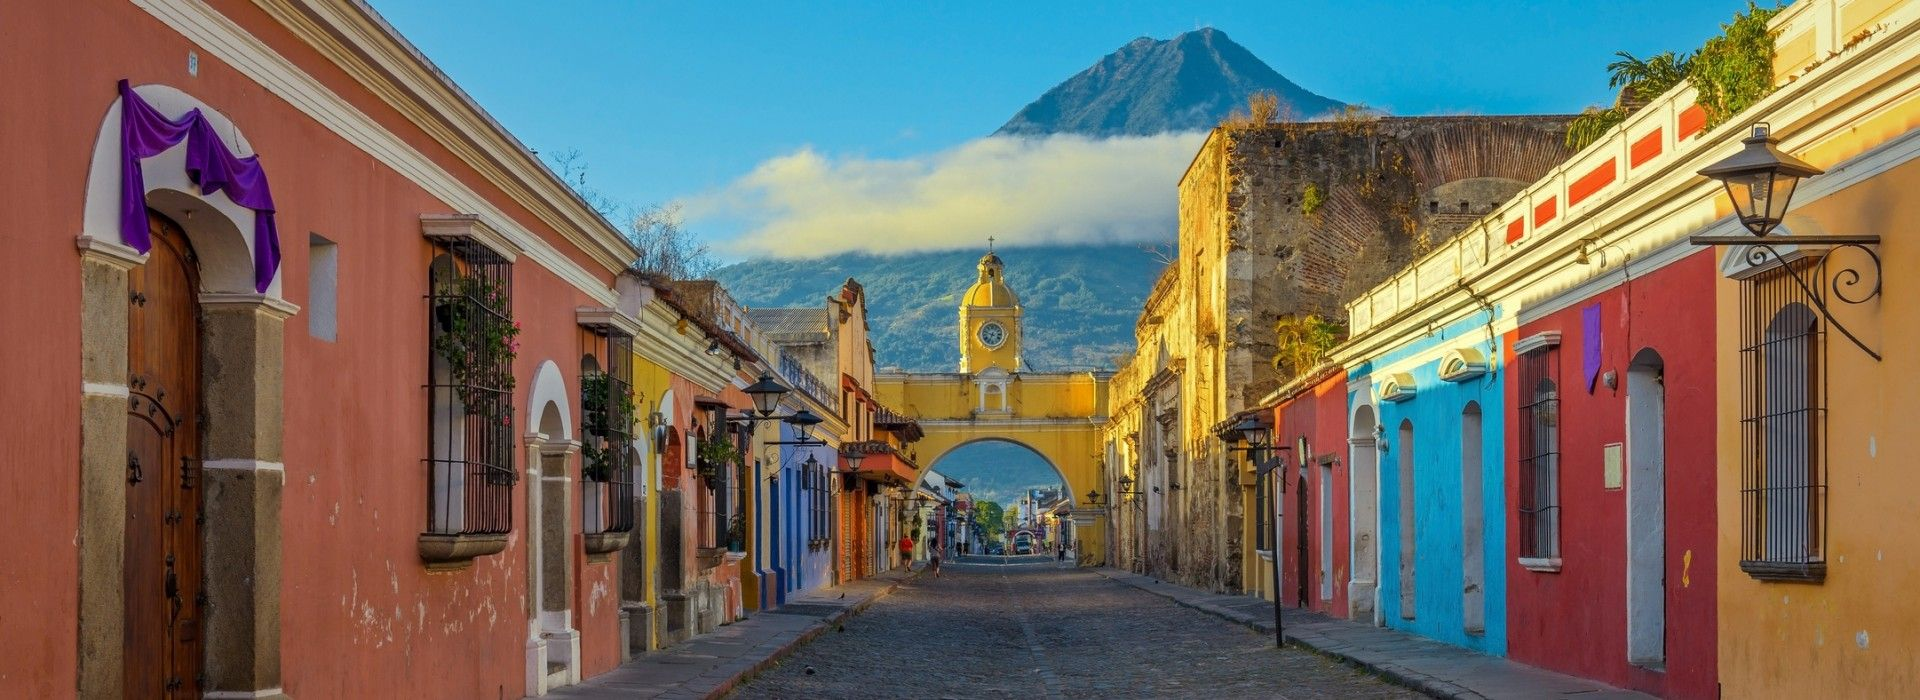 Santa Catalina Arch in Guatemala